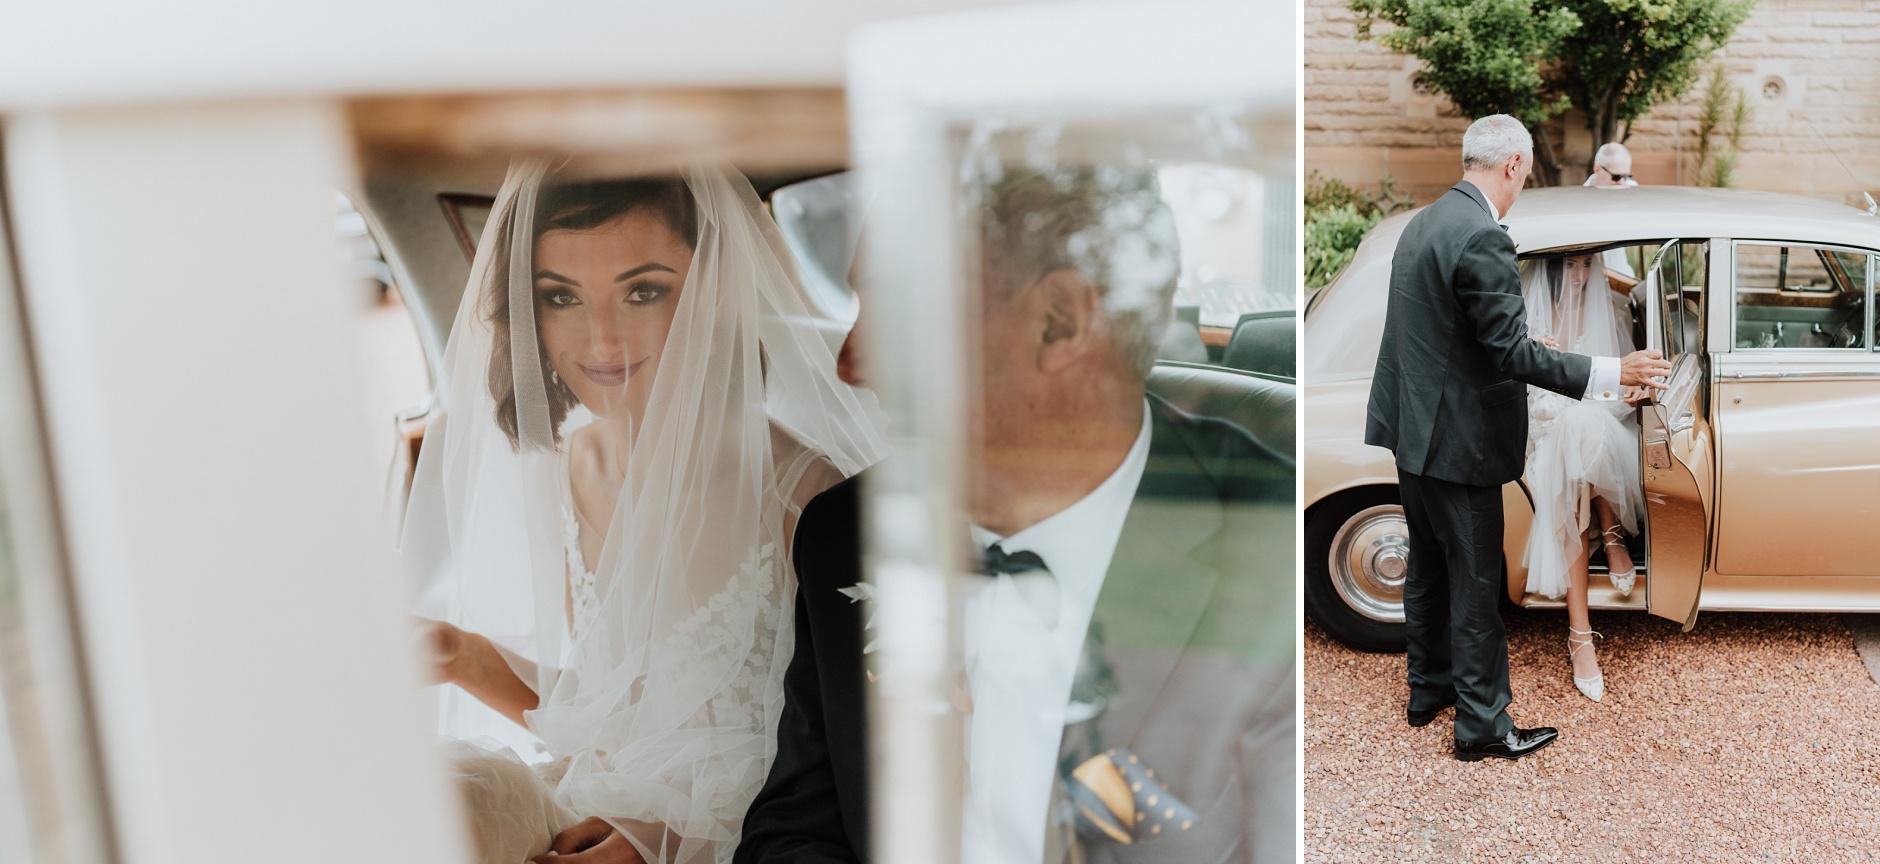 Sydney-Wedding-Photographer_0089.jpg